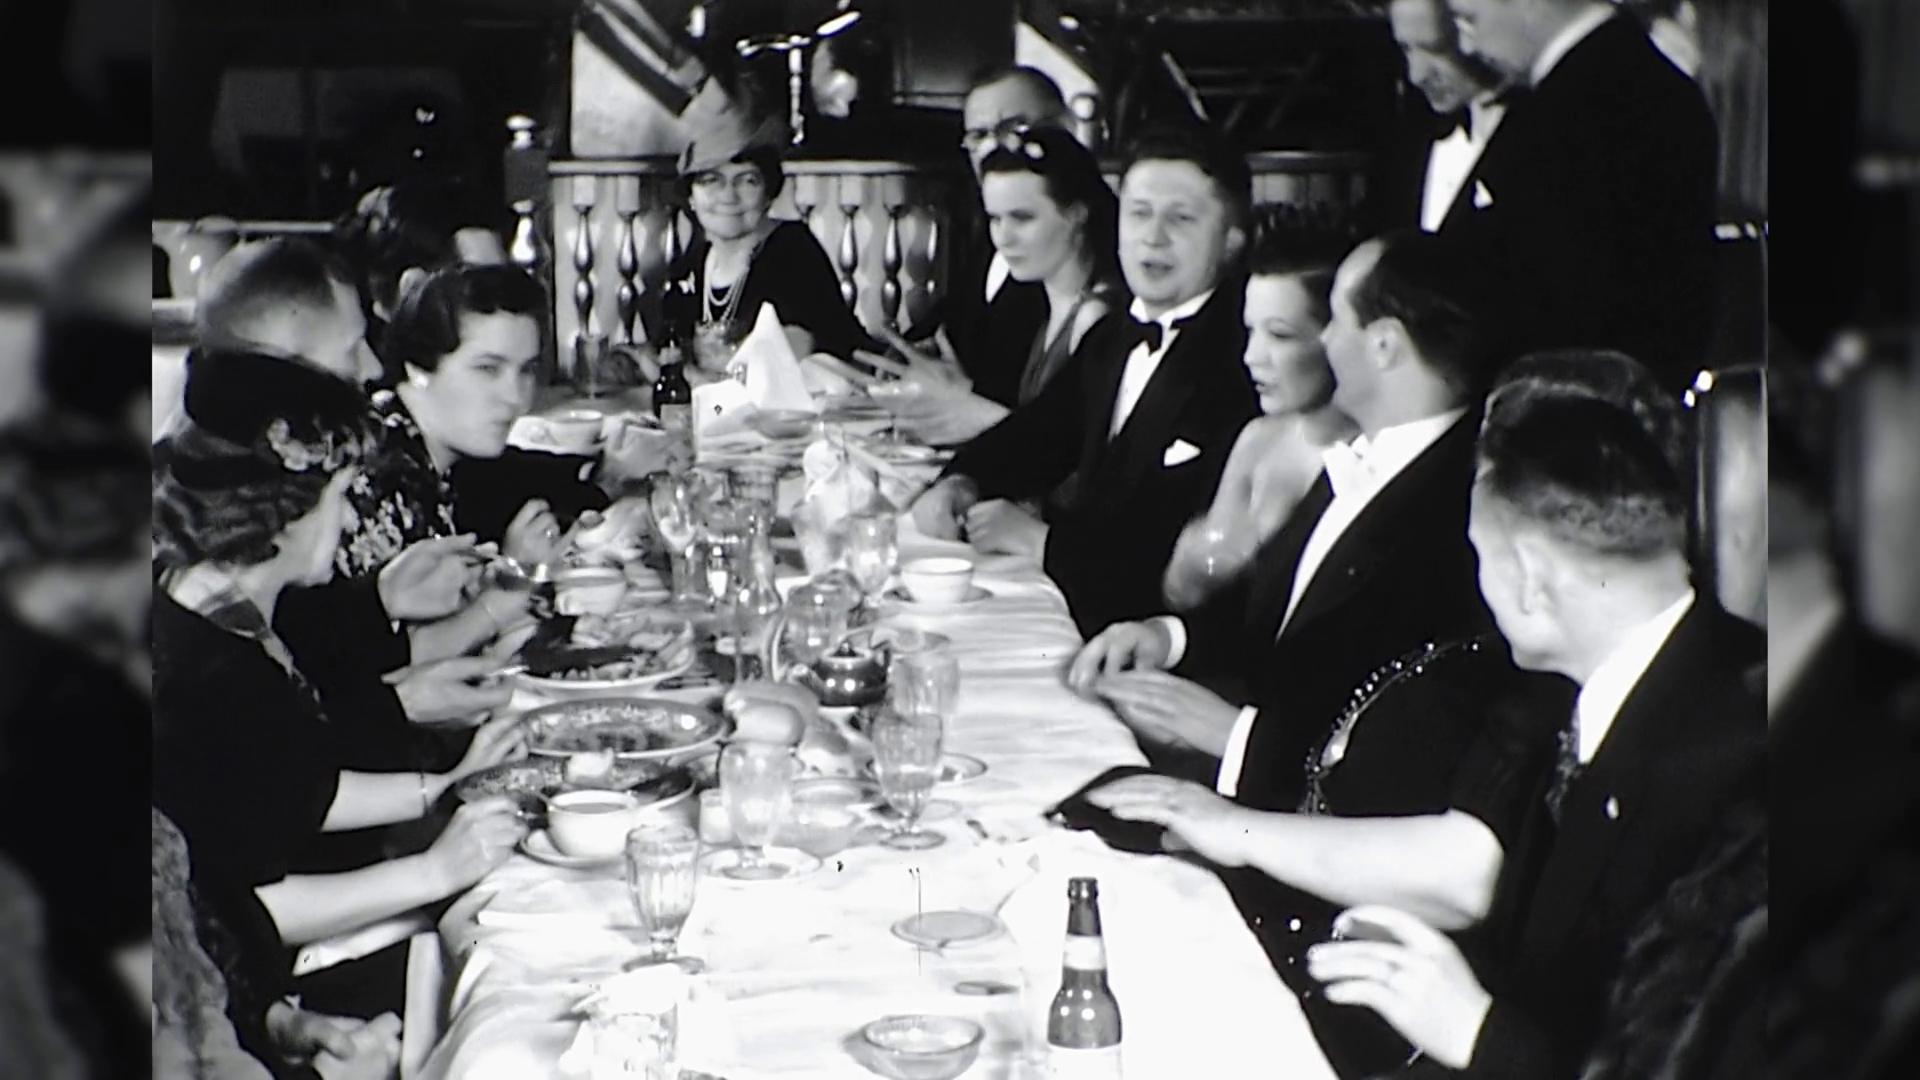 High society, 1930s